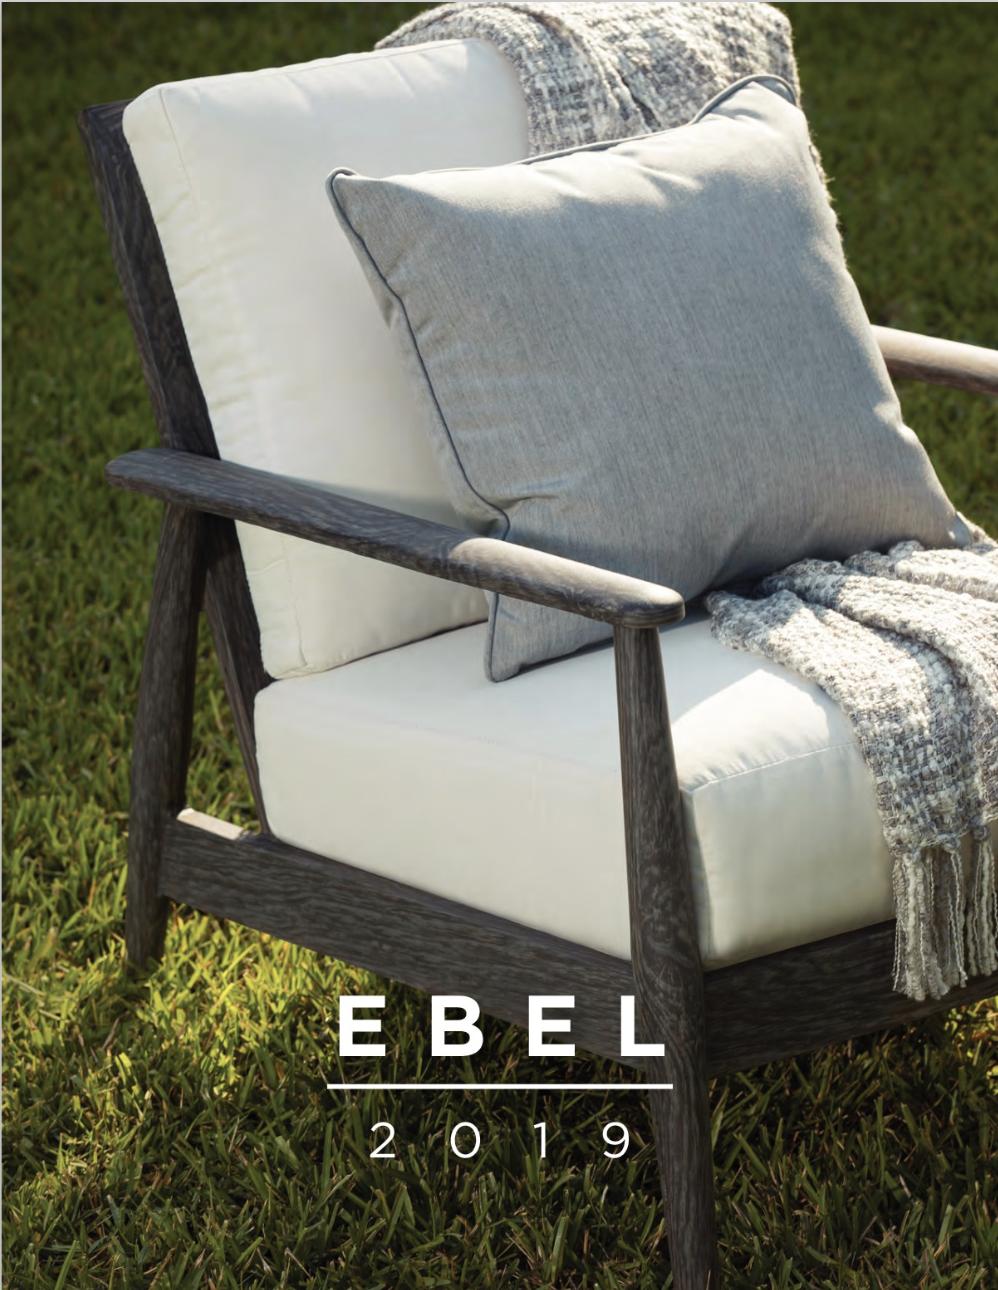 Downloadable PDF    Ebel Catalog on Steelyard